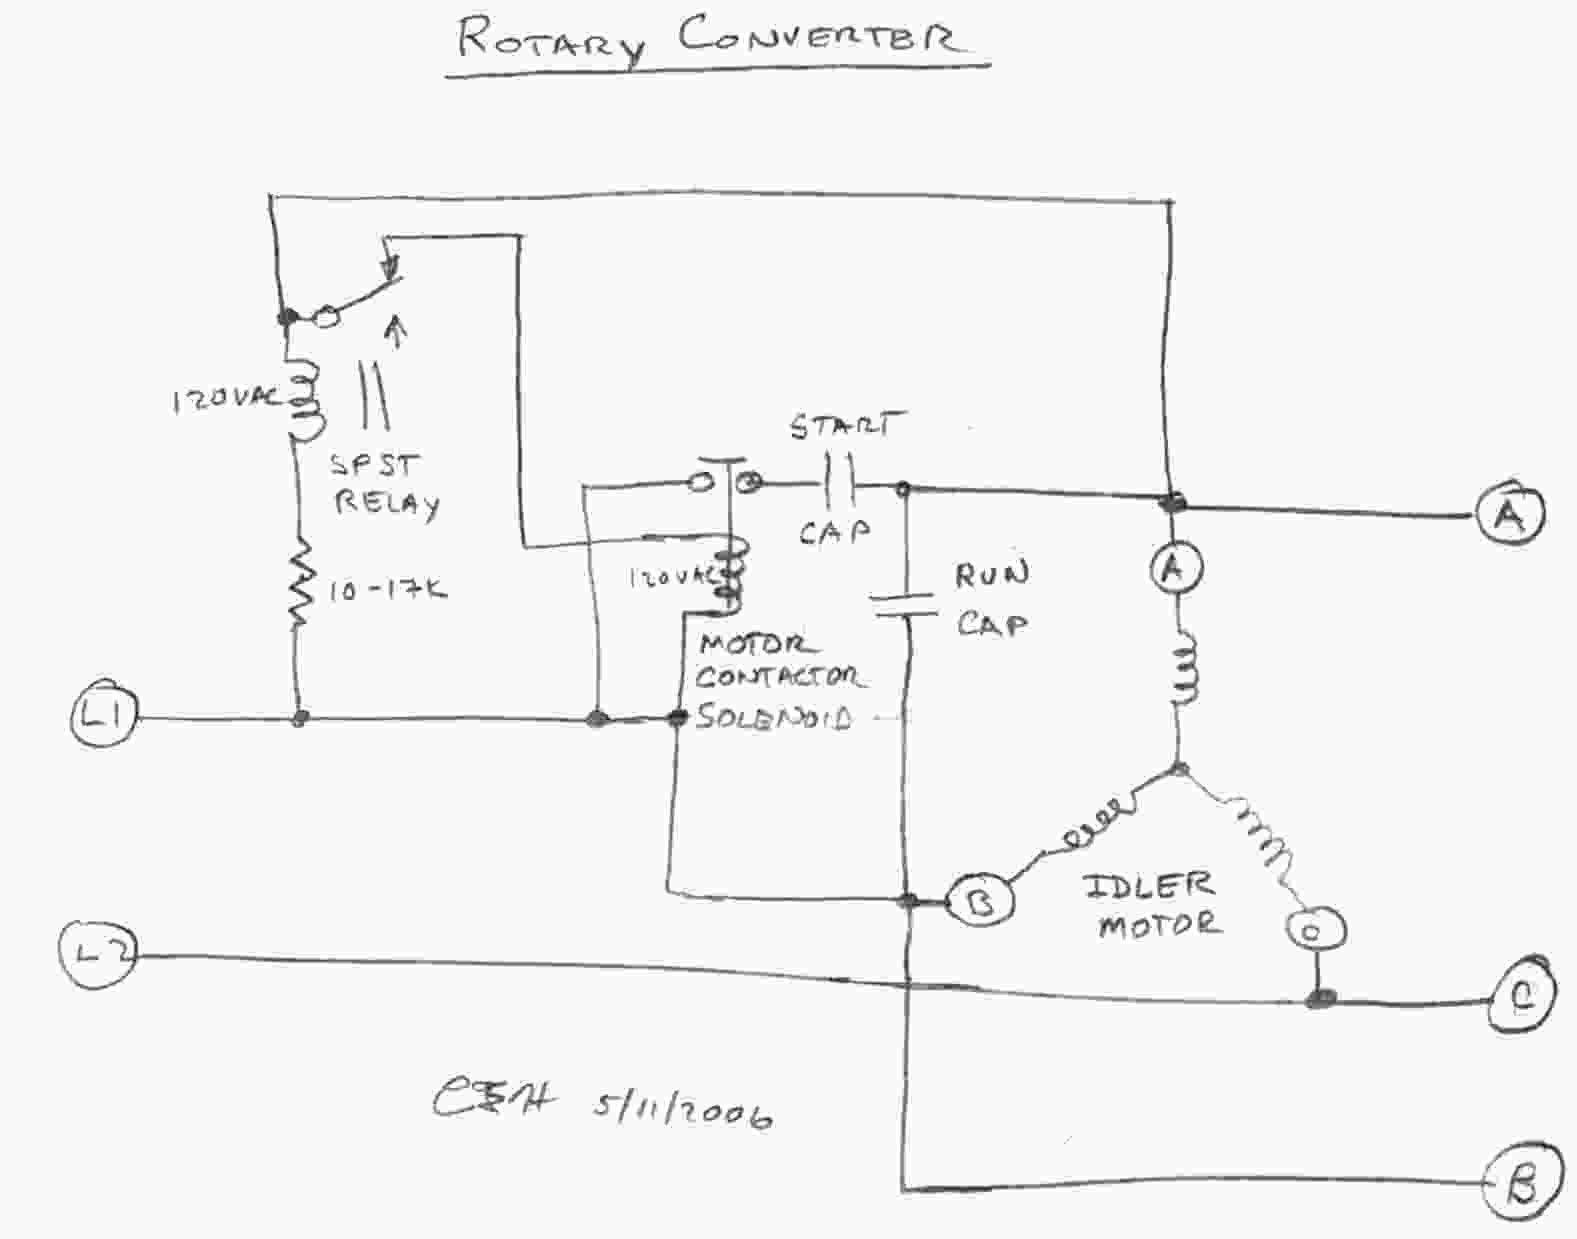 hight resolution of 3 phase generator wiring diagram lima wiring diagram sch 3 phase generator wiring diagram lima wiring